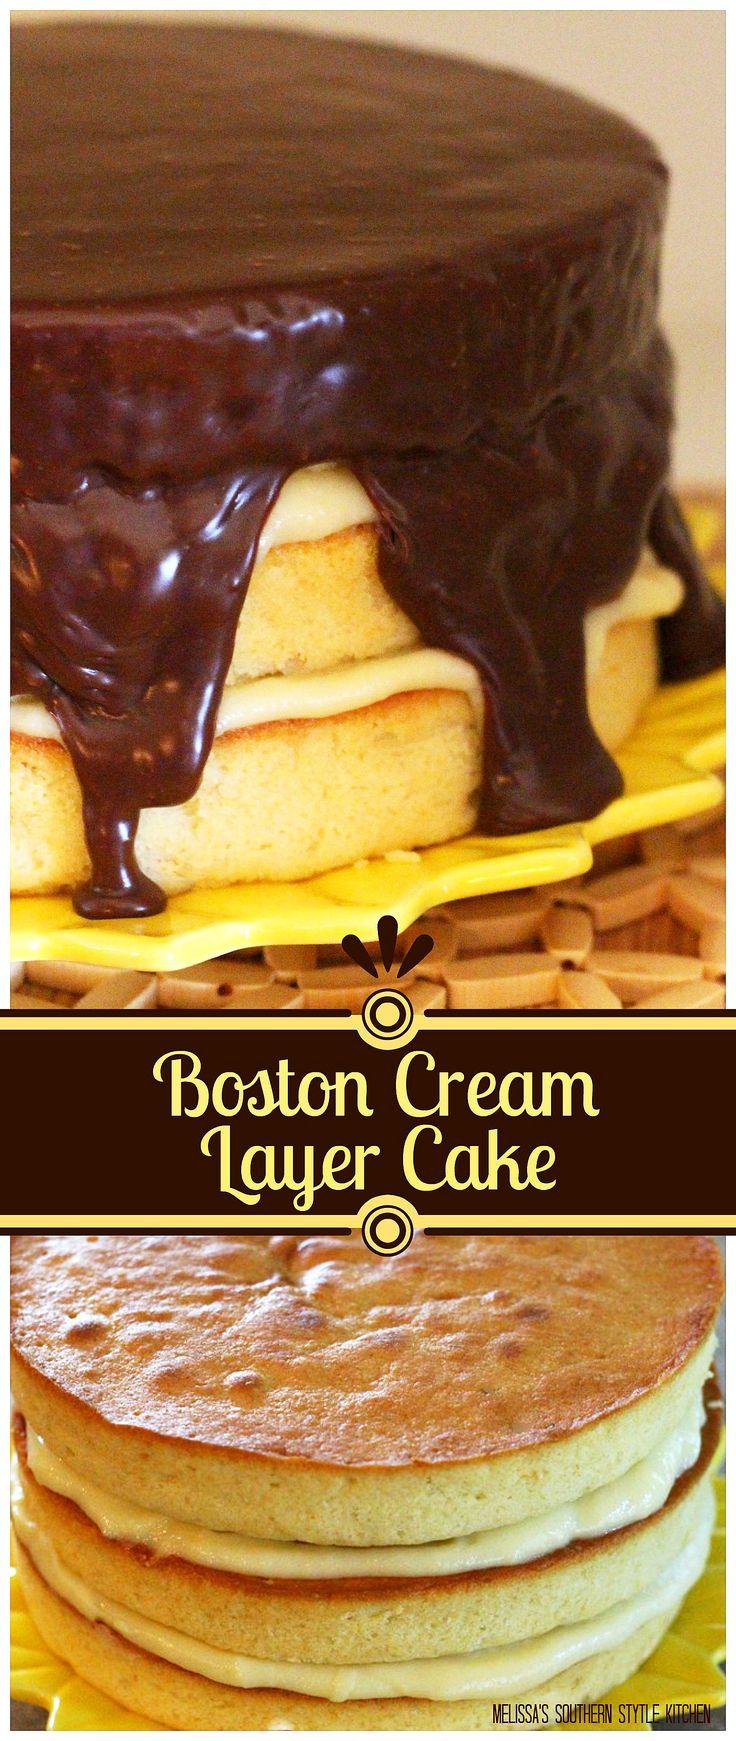 New York Times Boston Cream Cake Recipe